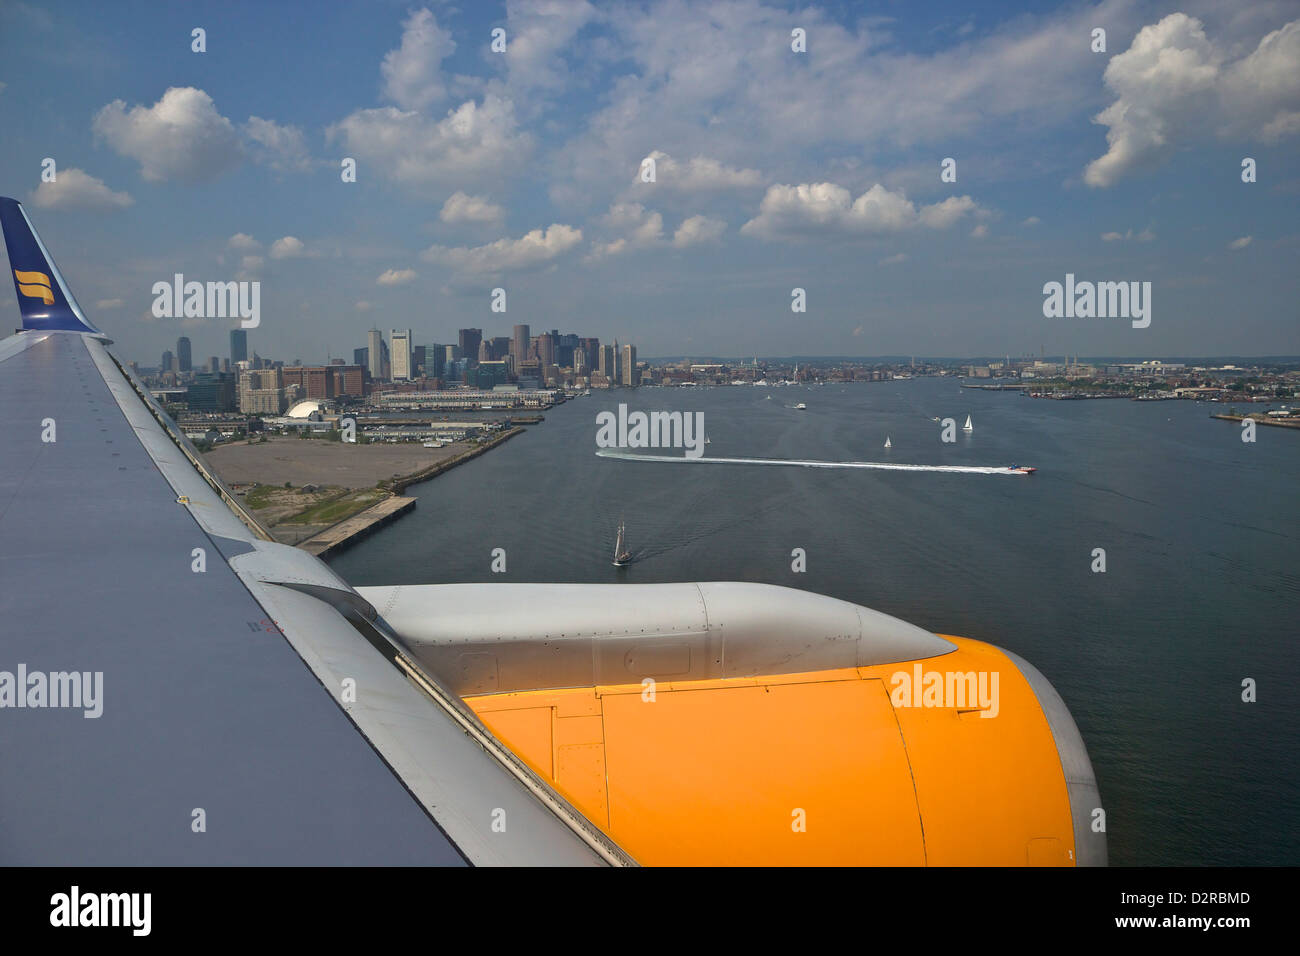 Vista dall'Icelandair passeggeri aerei jet finestra su Boston, Massachusetts, New England, STATI UNITI D'AMERICA Immagini Stock